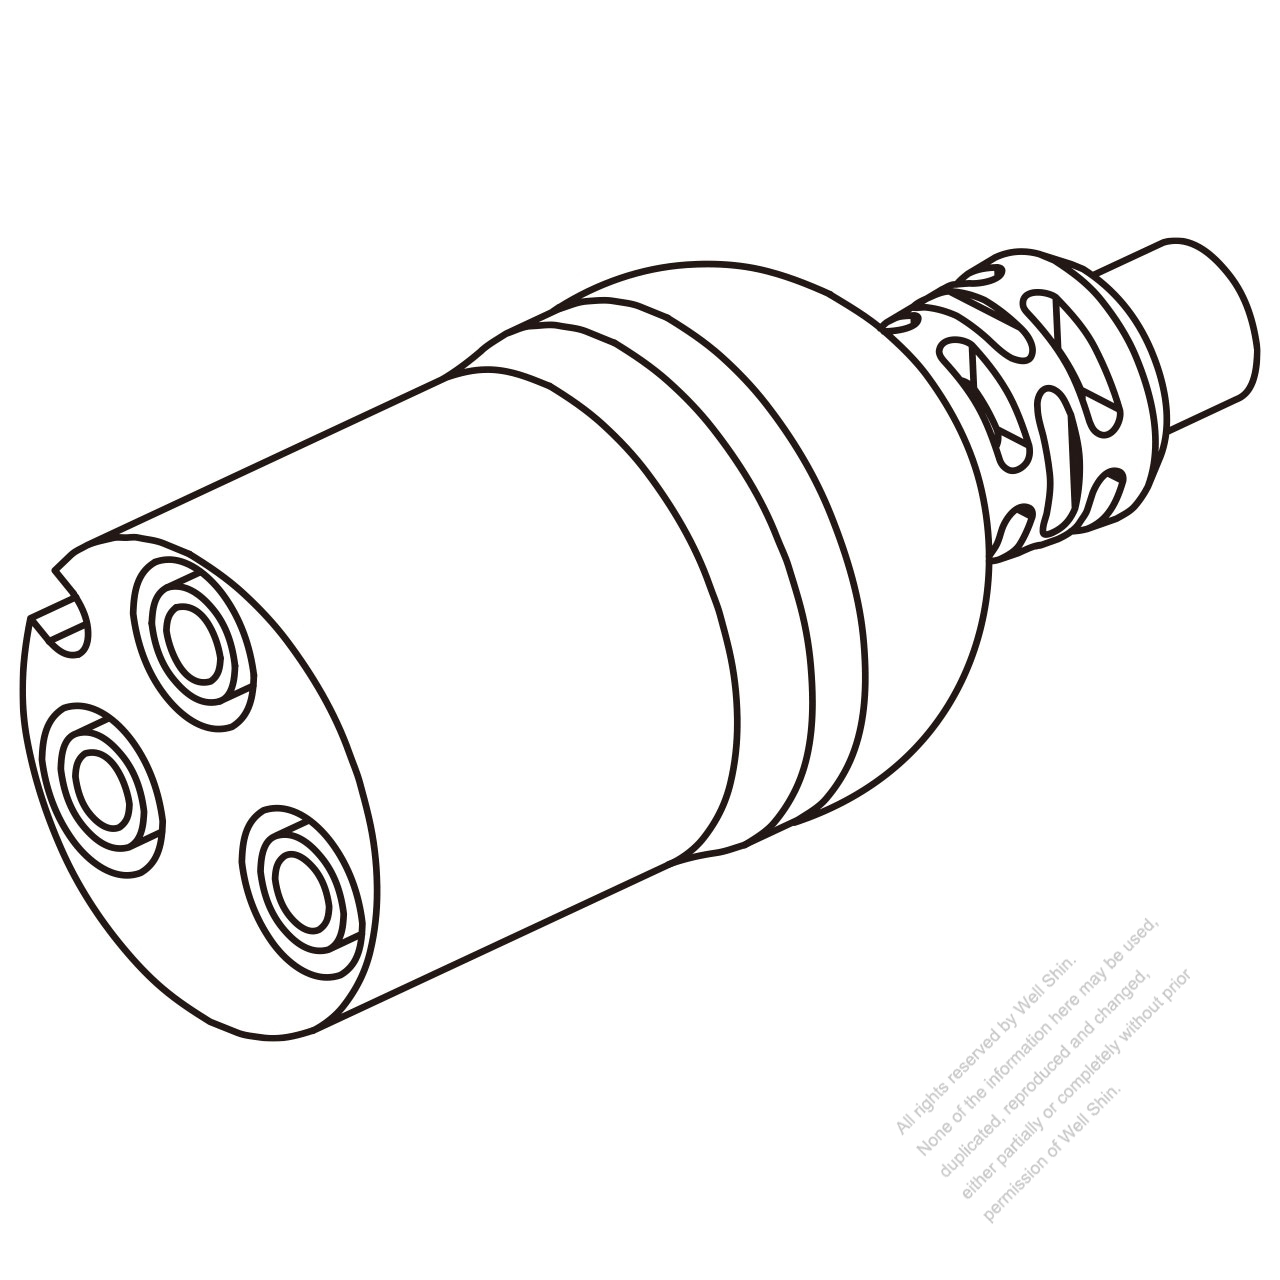 45a 3 Pin Connector Well Shin Technology Co Ltd